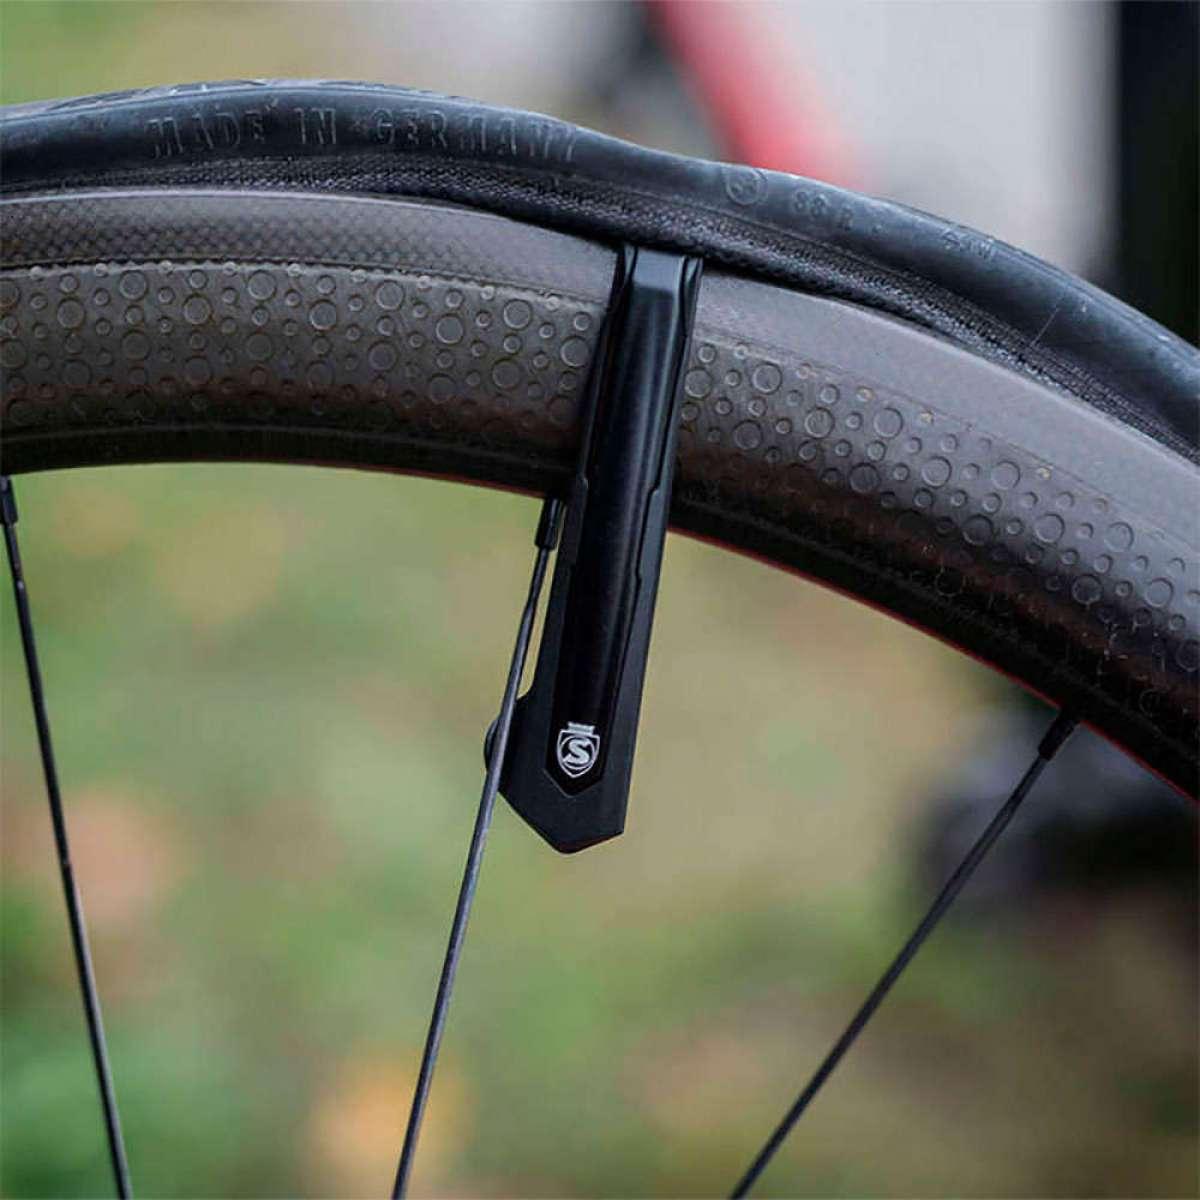 Silca Tire Levers Premio, unas palancas de neumático diseñadas para ruedas de carbono